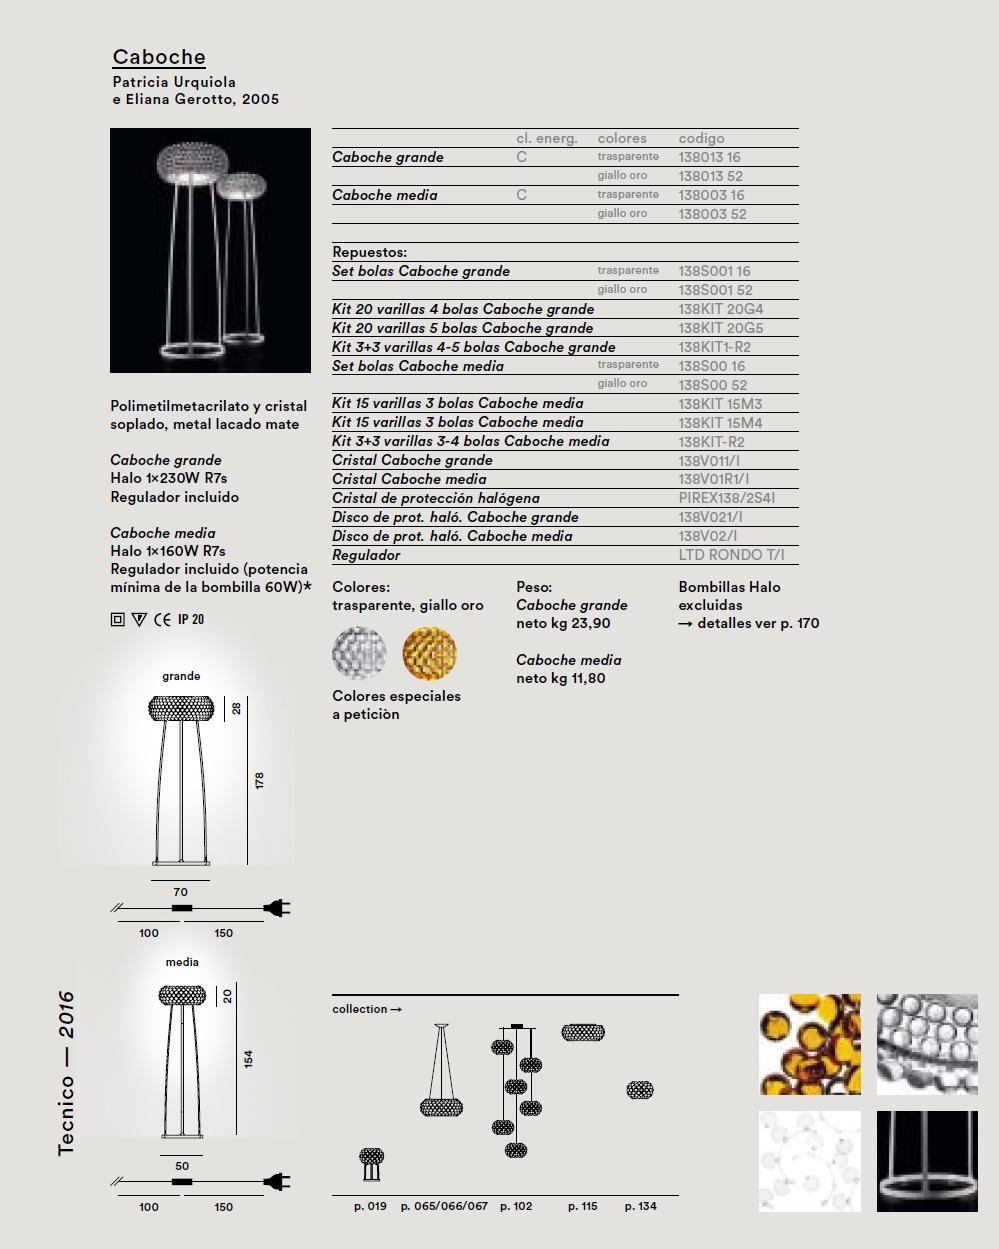 foscarini caboche zubeh rteil medium ersatzteile 138v01r1 i l mparas de dise o. Black Bedroom Furniture Sets. Home Design Ideas